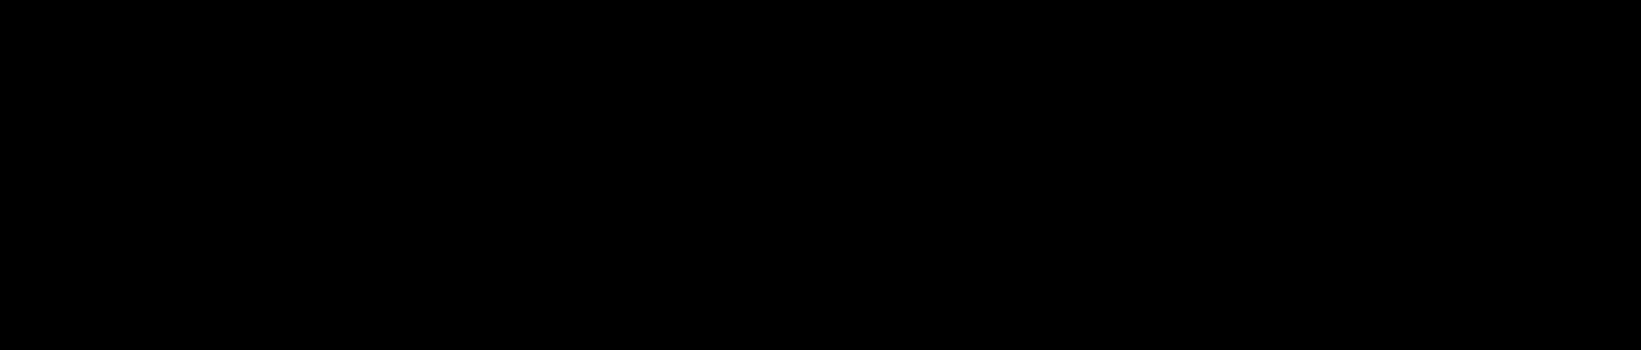 everest_logo_100white@1x.png